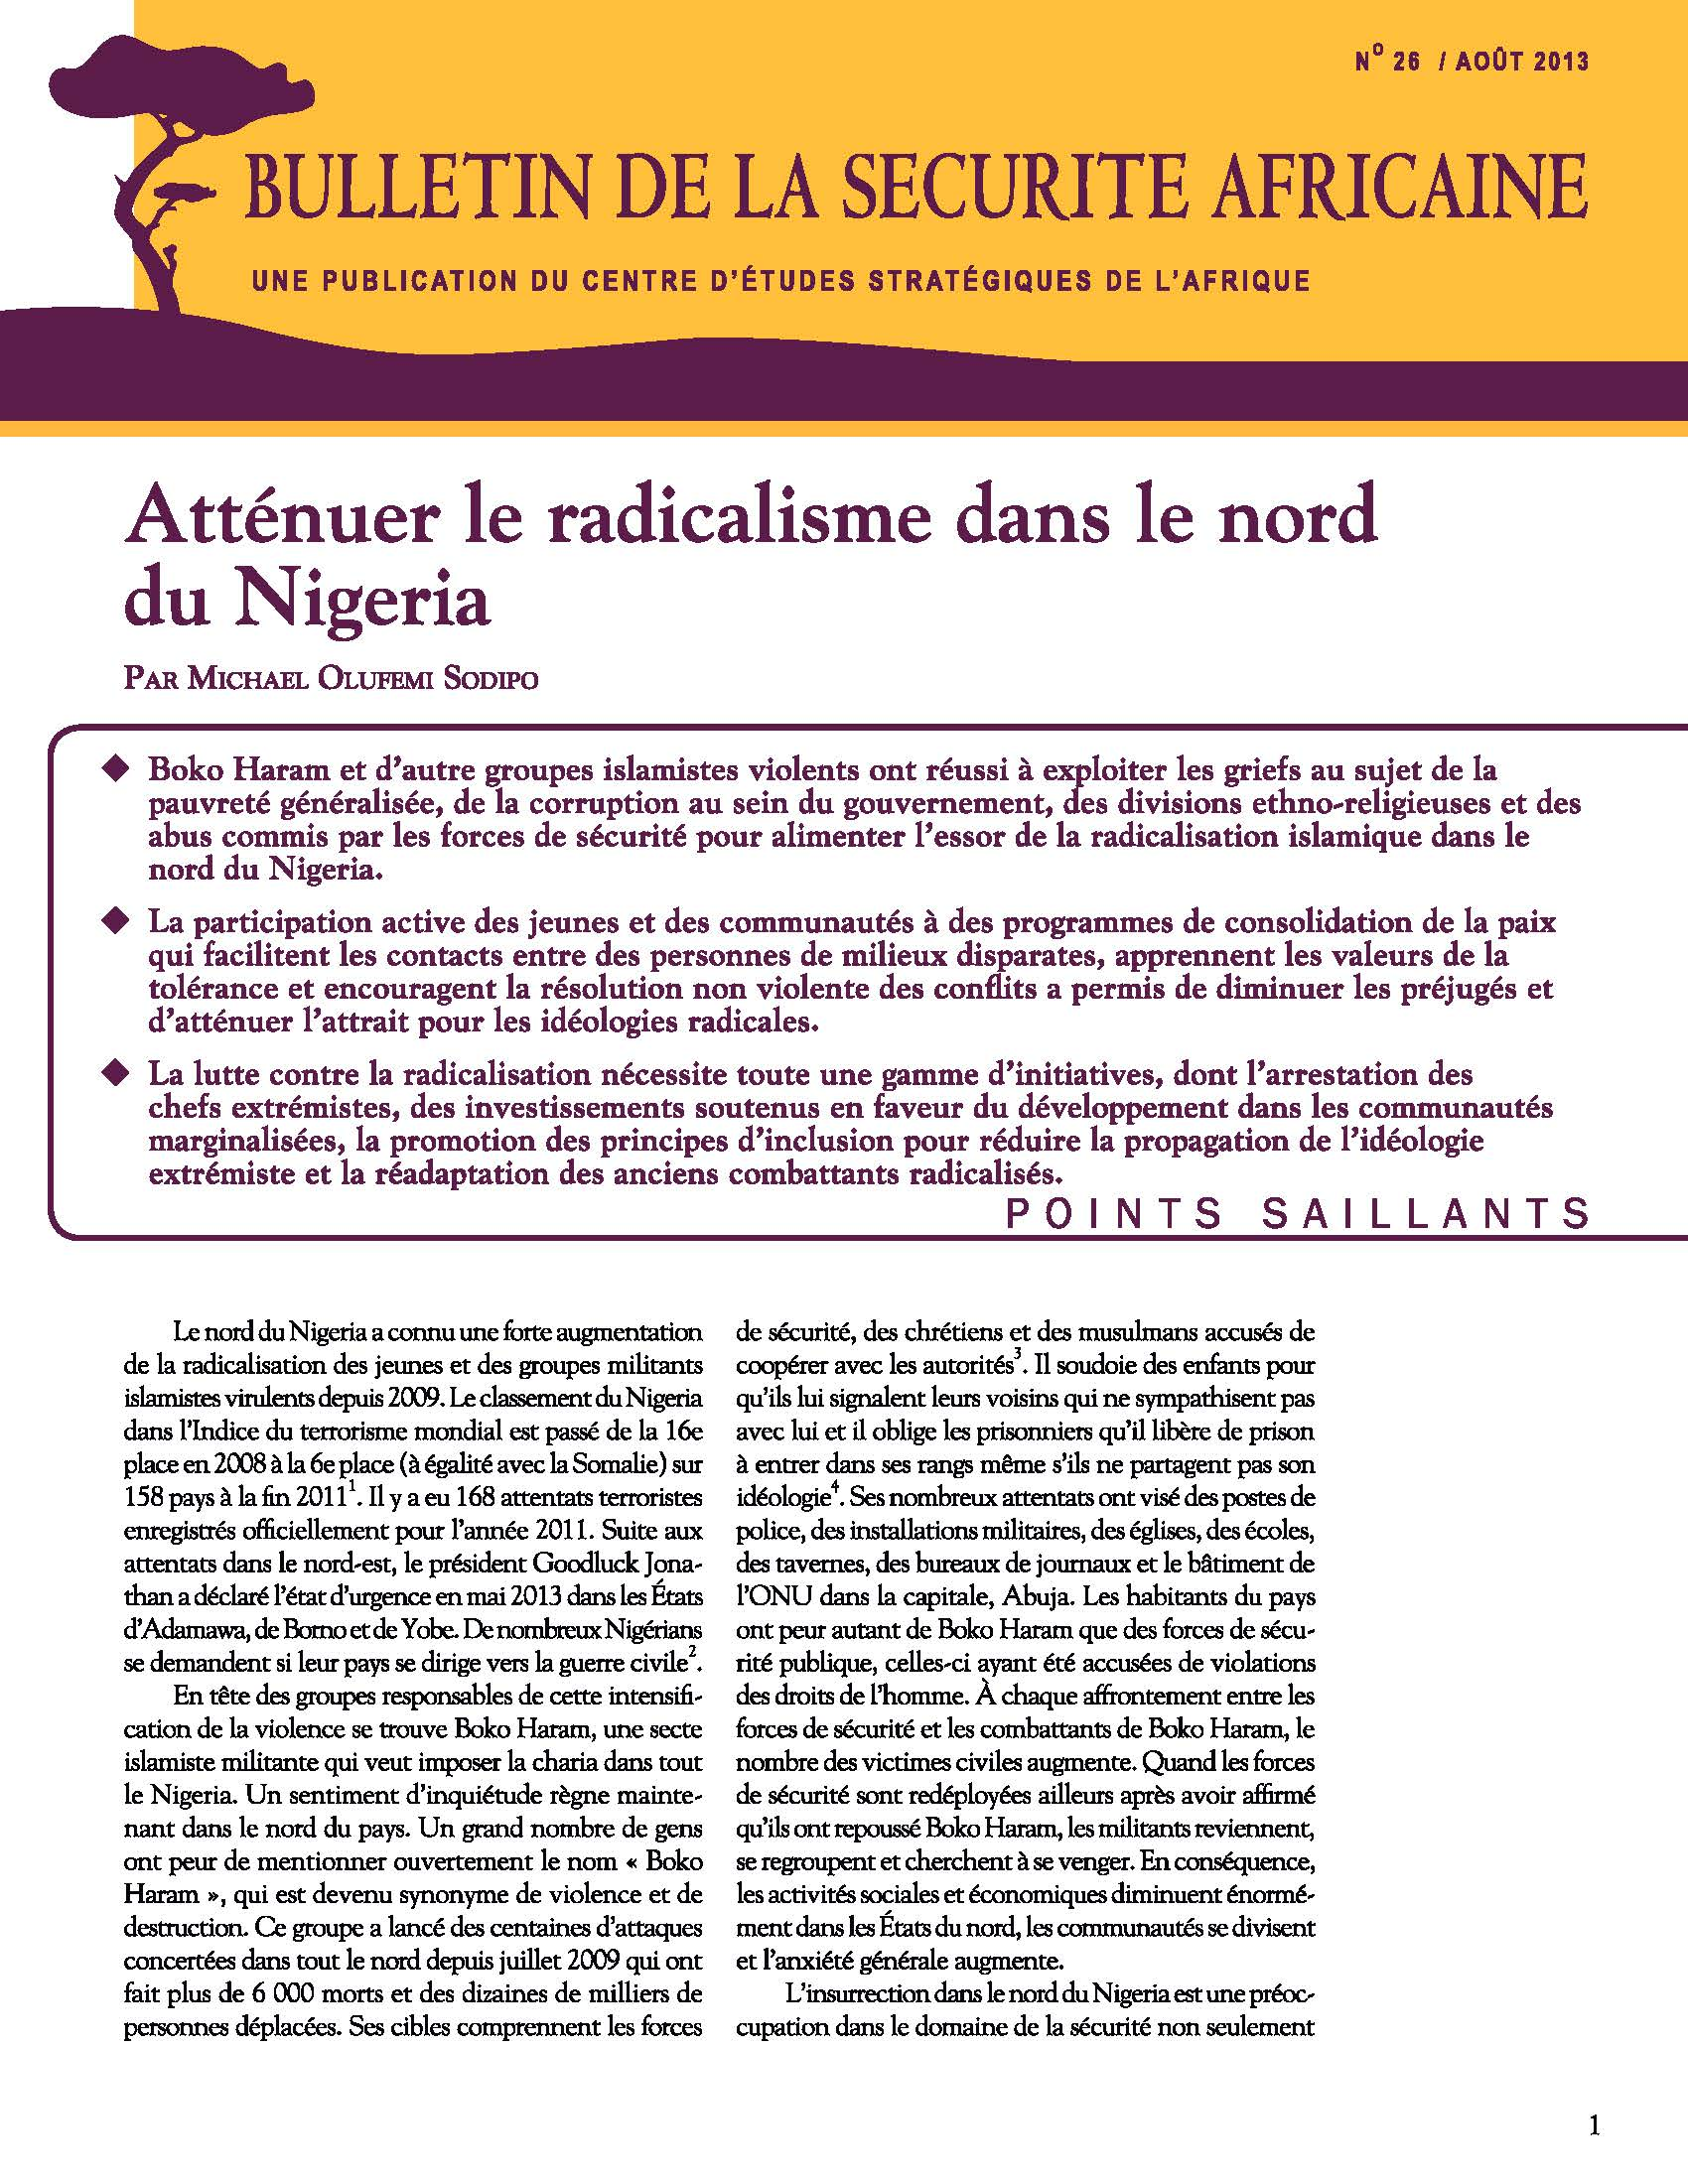 Africa-Security-Brief-No.-26-FR page 1